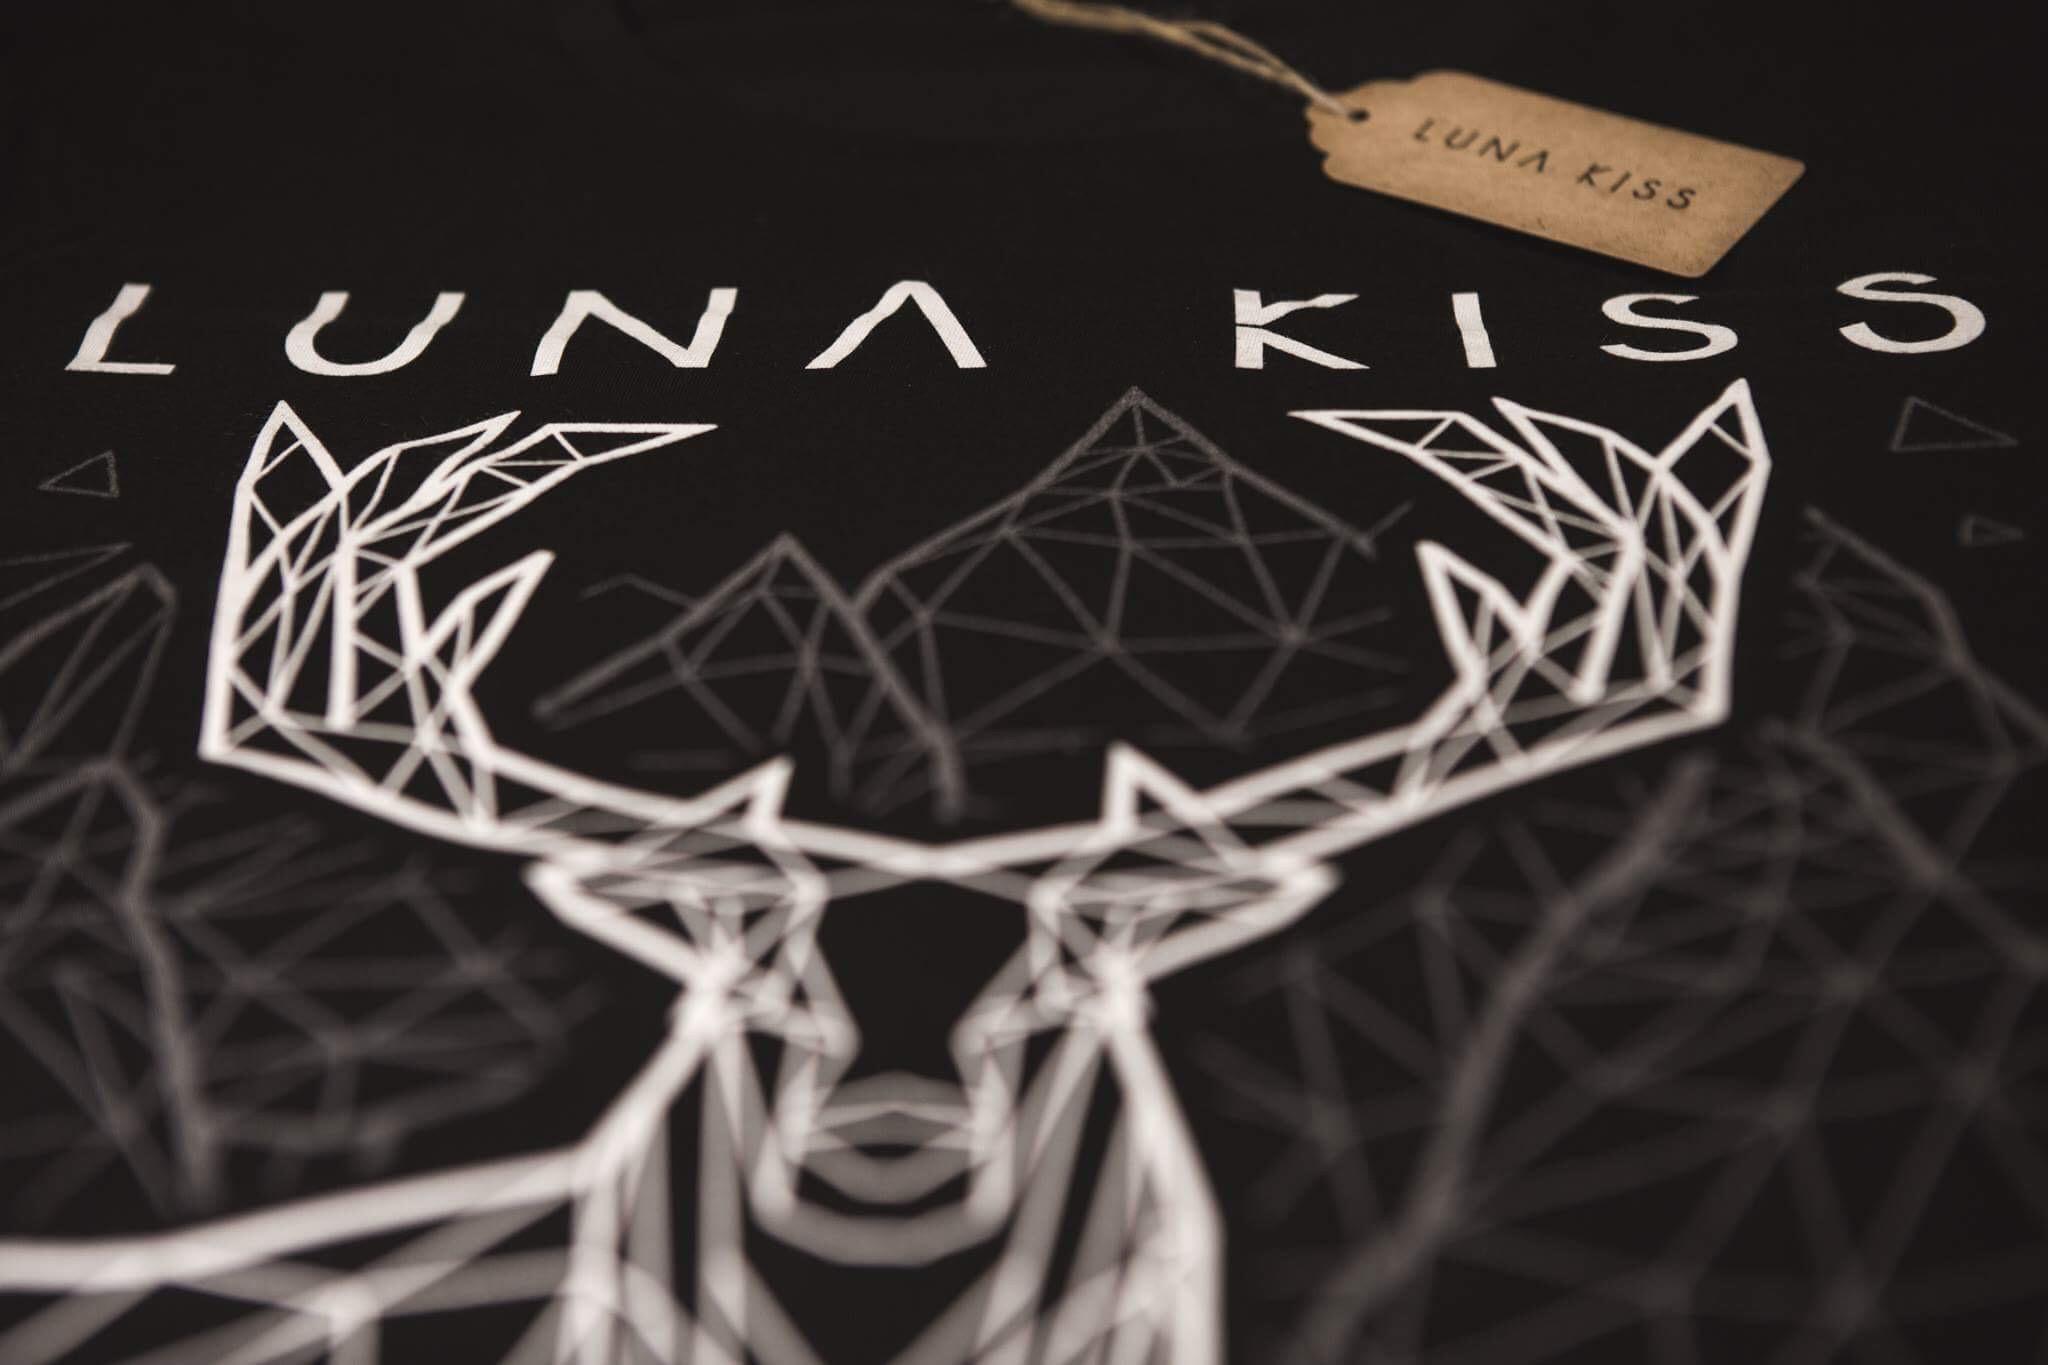 Deer T-shirt/CD bundle - Luna Kiss